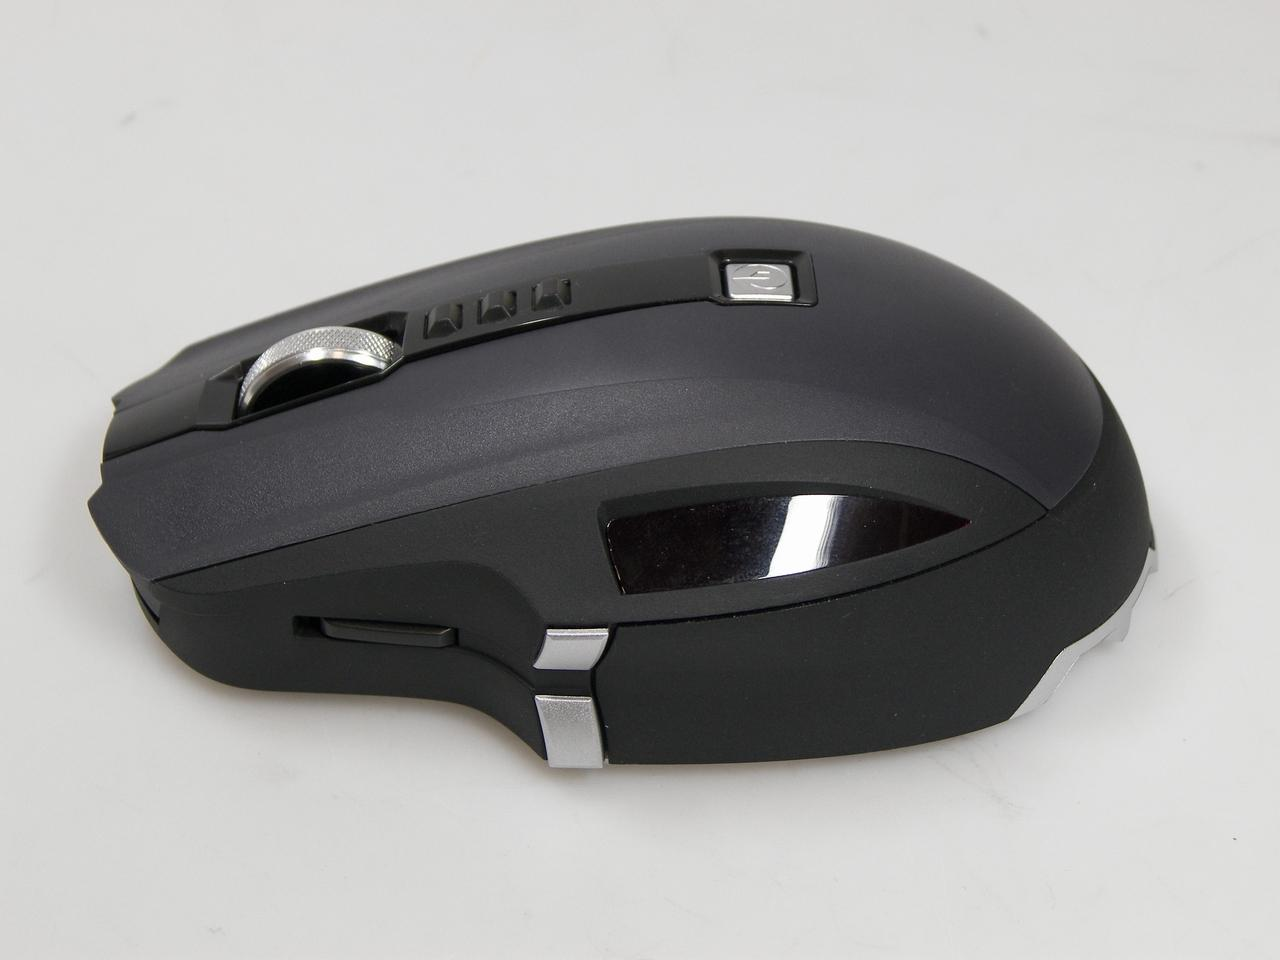 Microsoft Sidewinder X8 - Hands-on test of the wireless